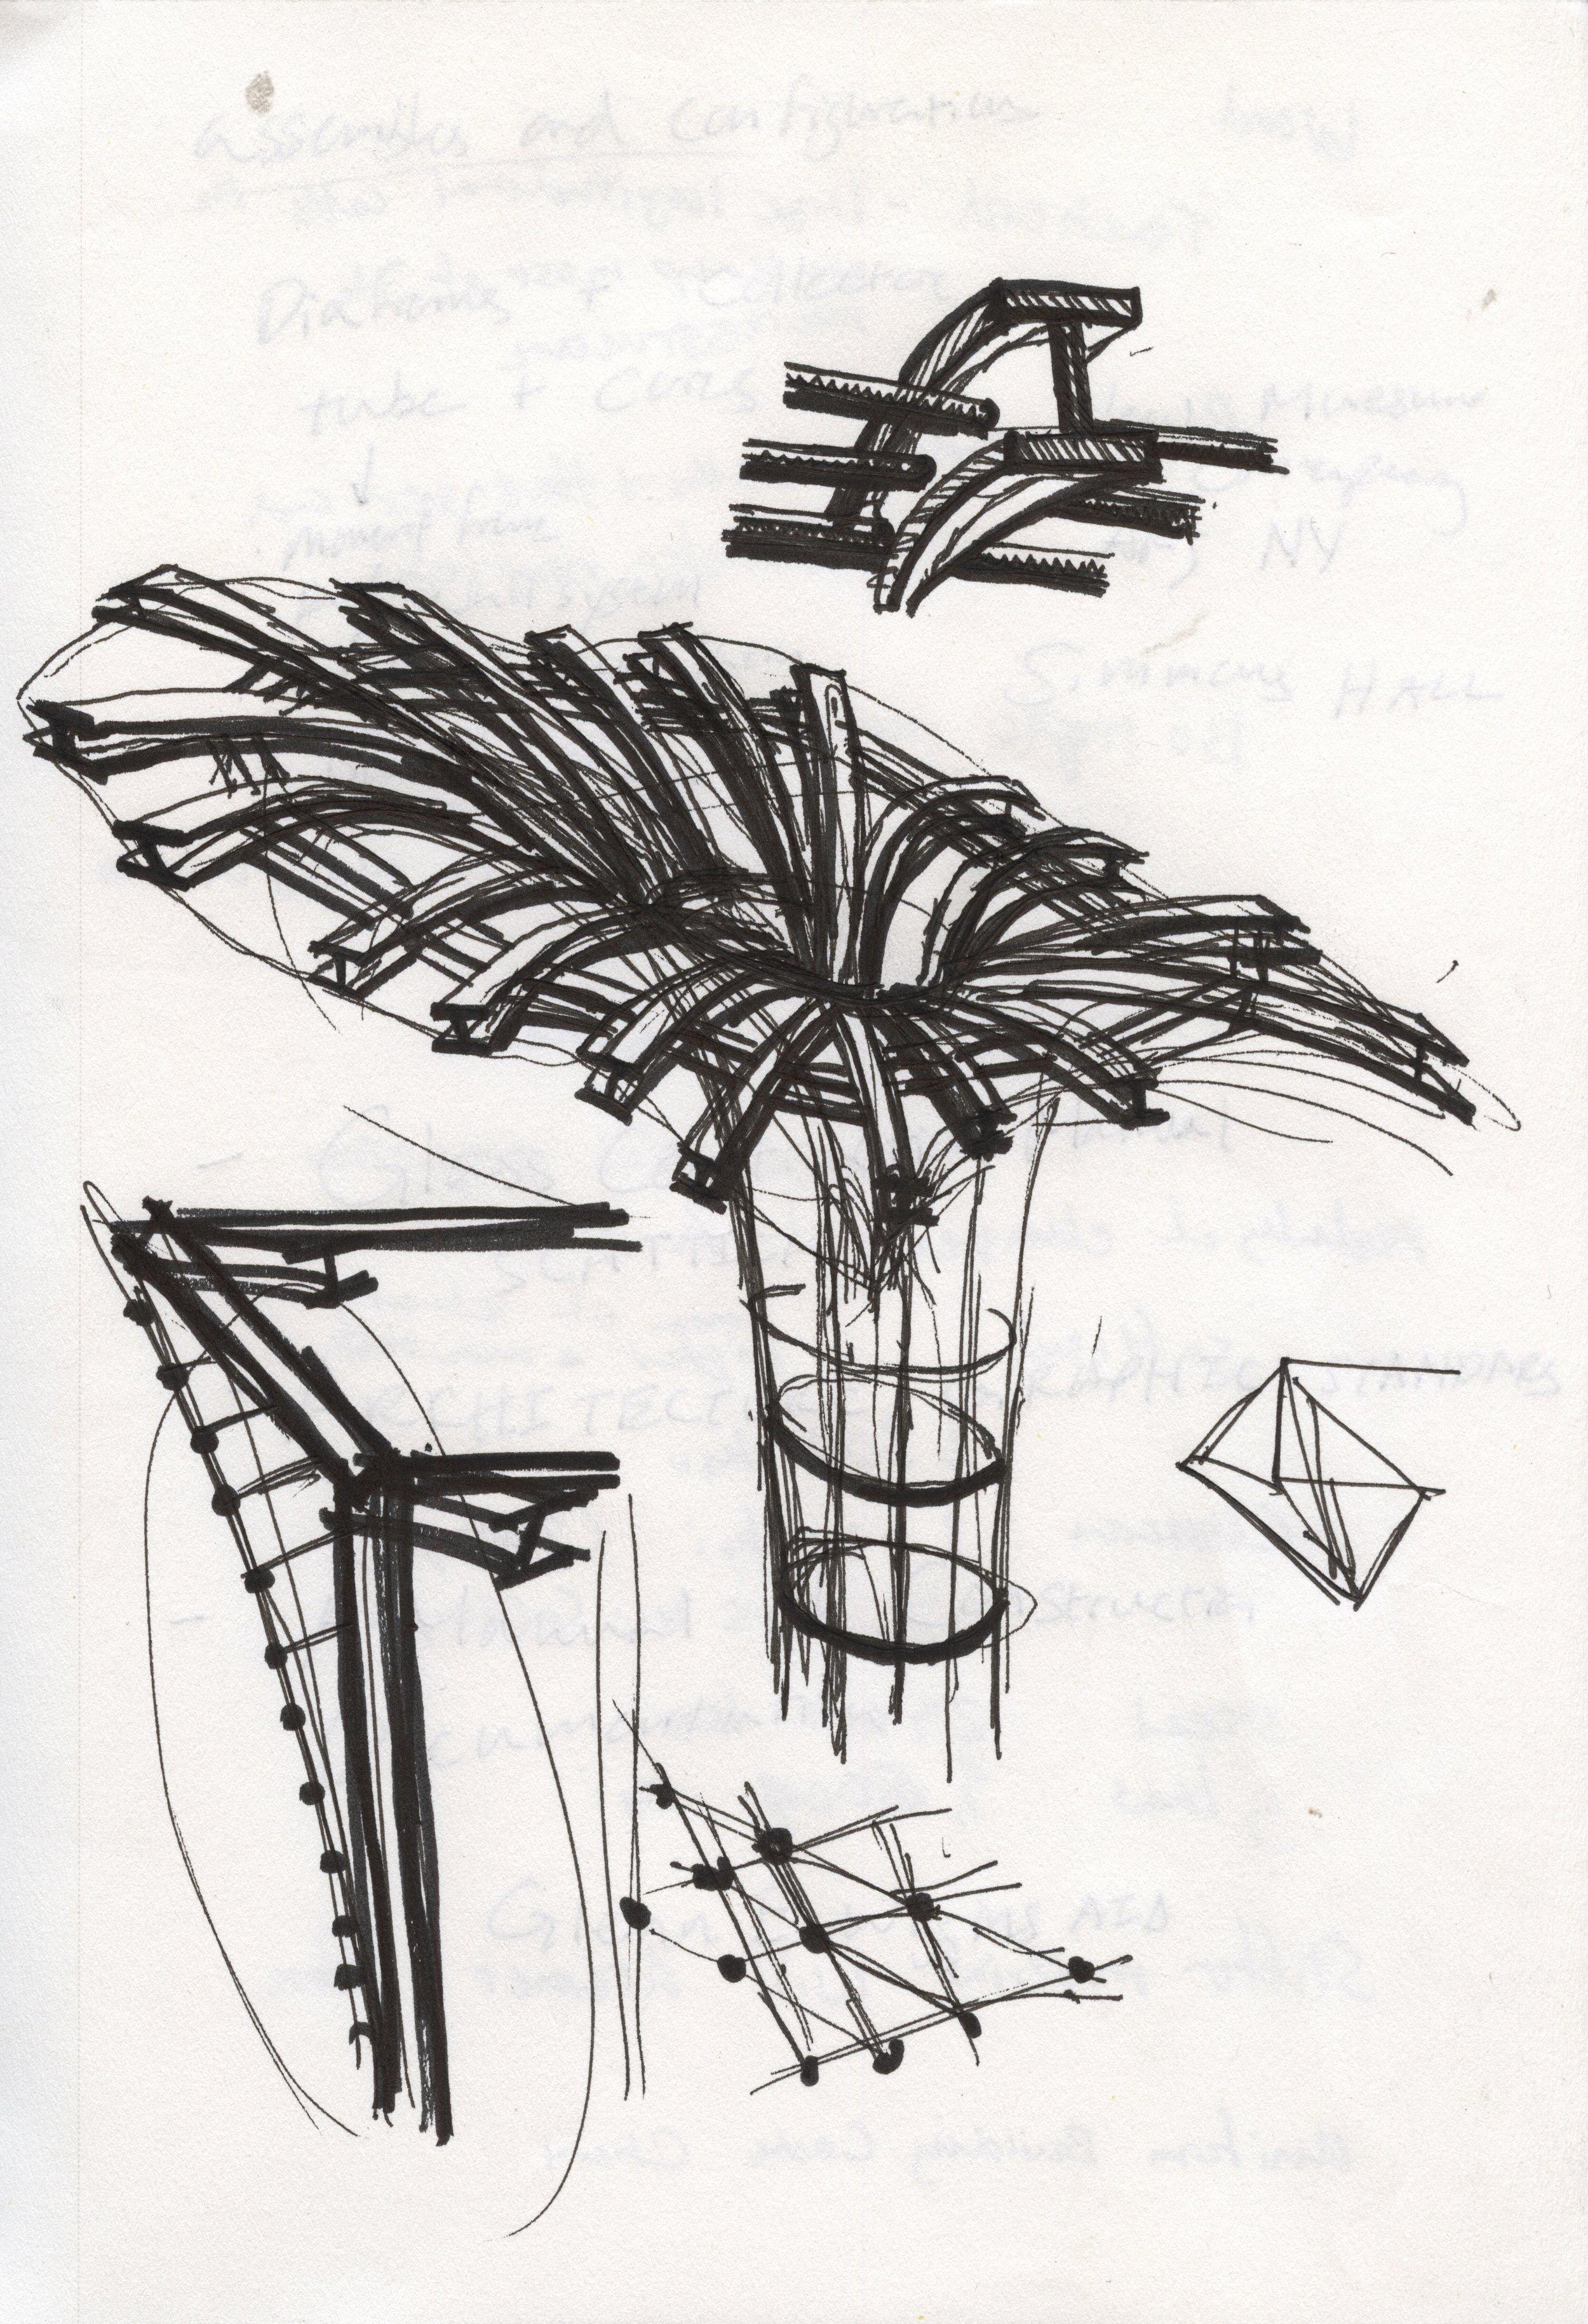 Structural Sketch